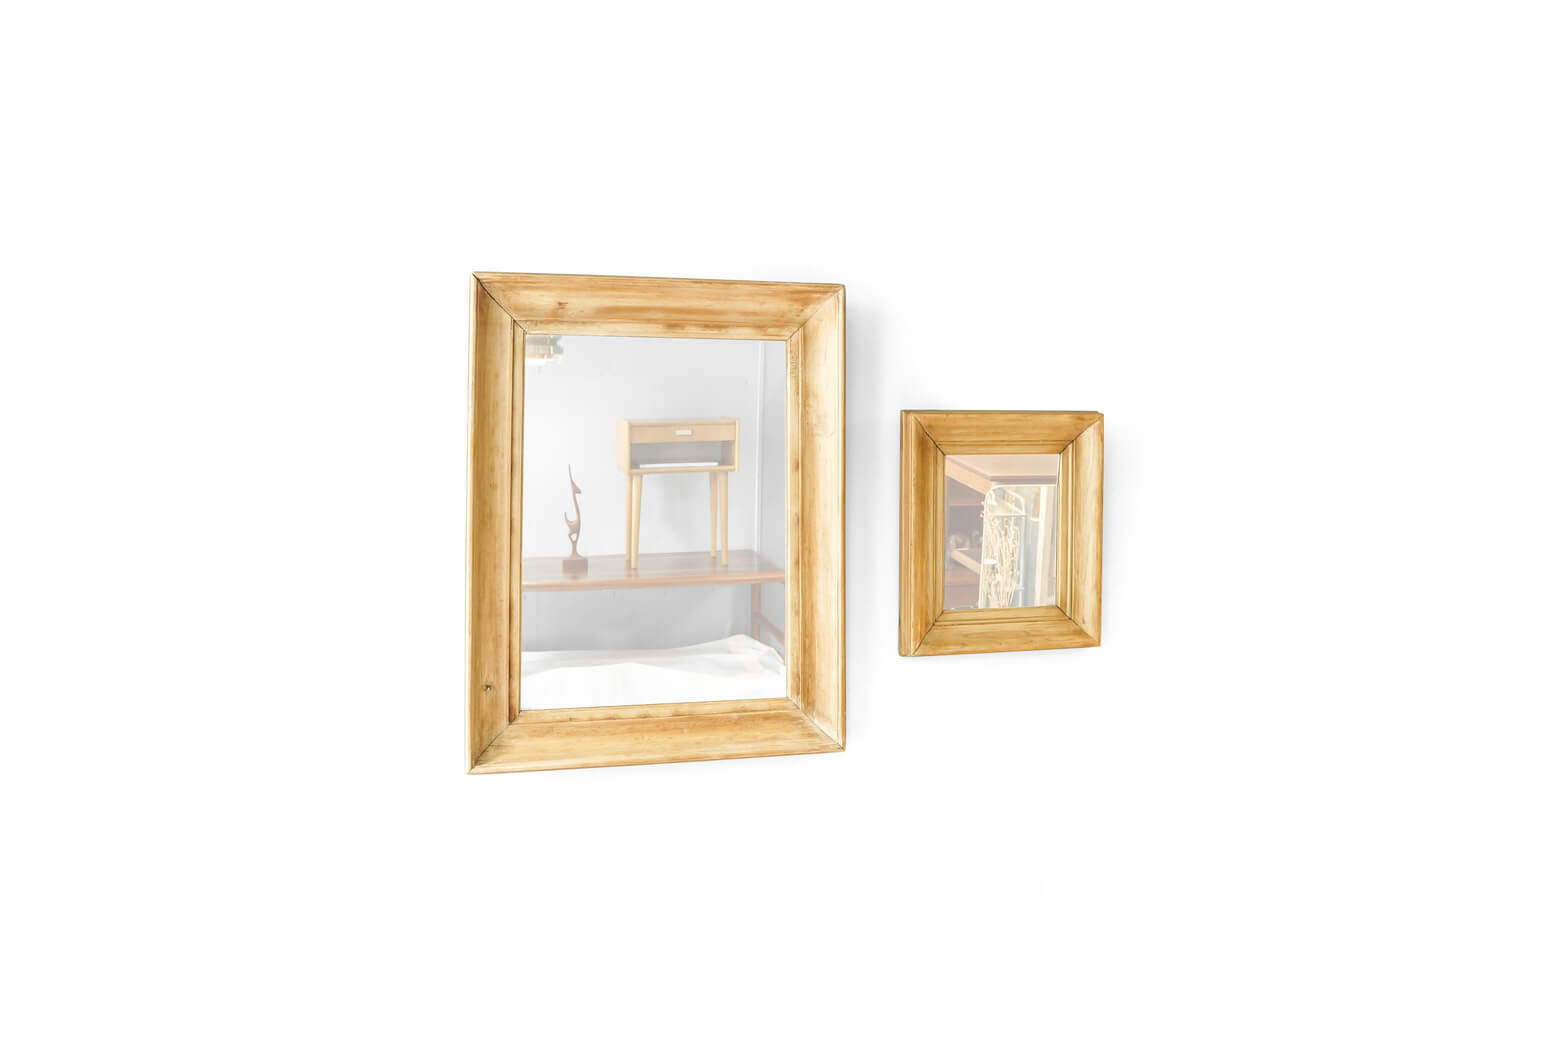 OLD PINE WOOD FLAME ANTIQUE WALL MIRROR / アンティーク ミラー パイン材 壁掛け 鏡